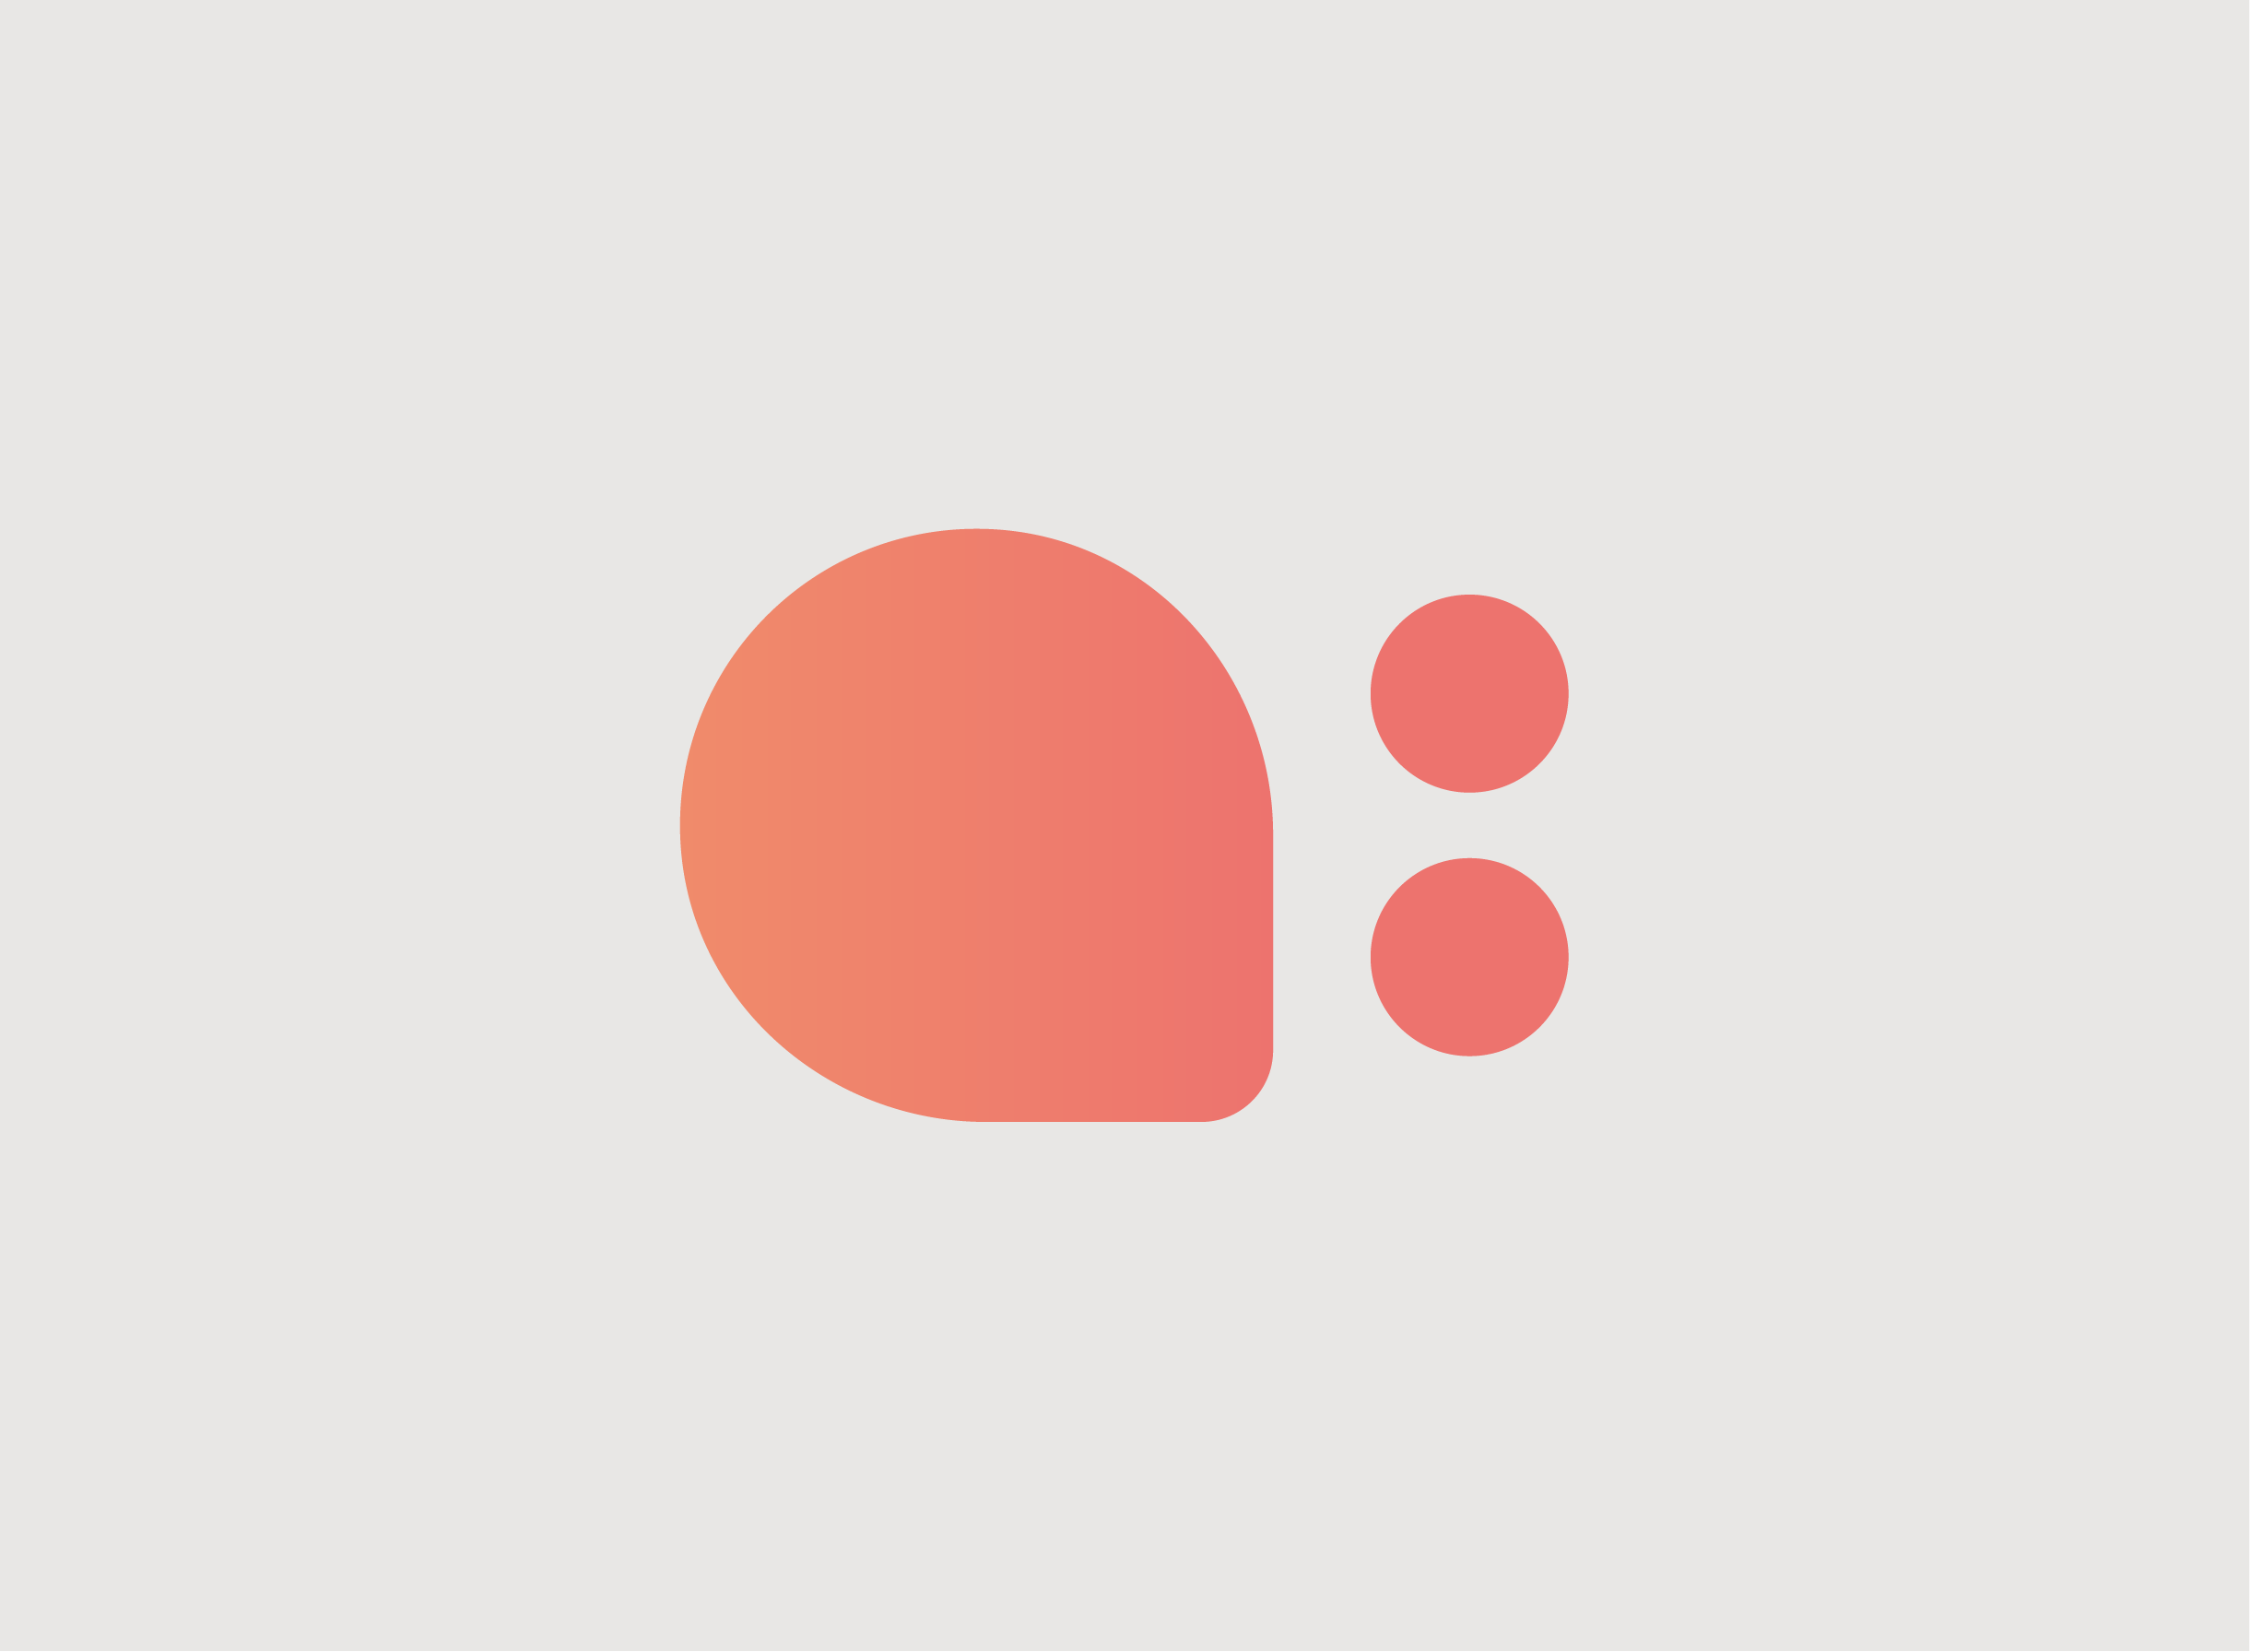 Airbeats logo-01-01.png